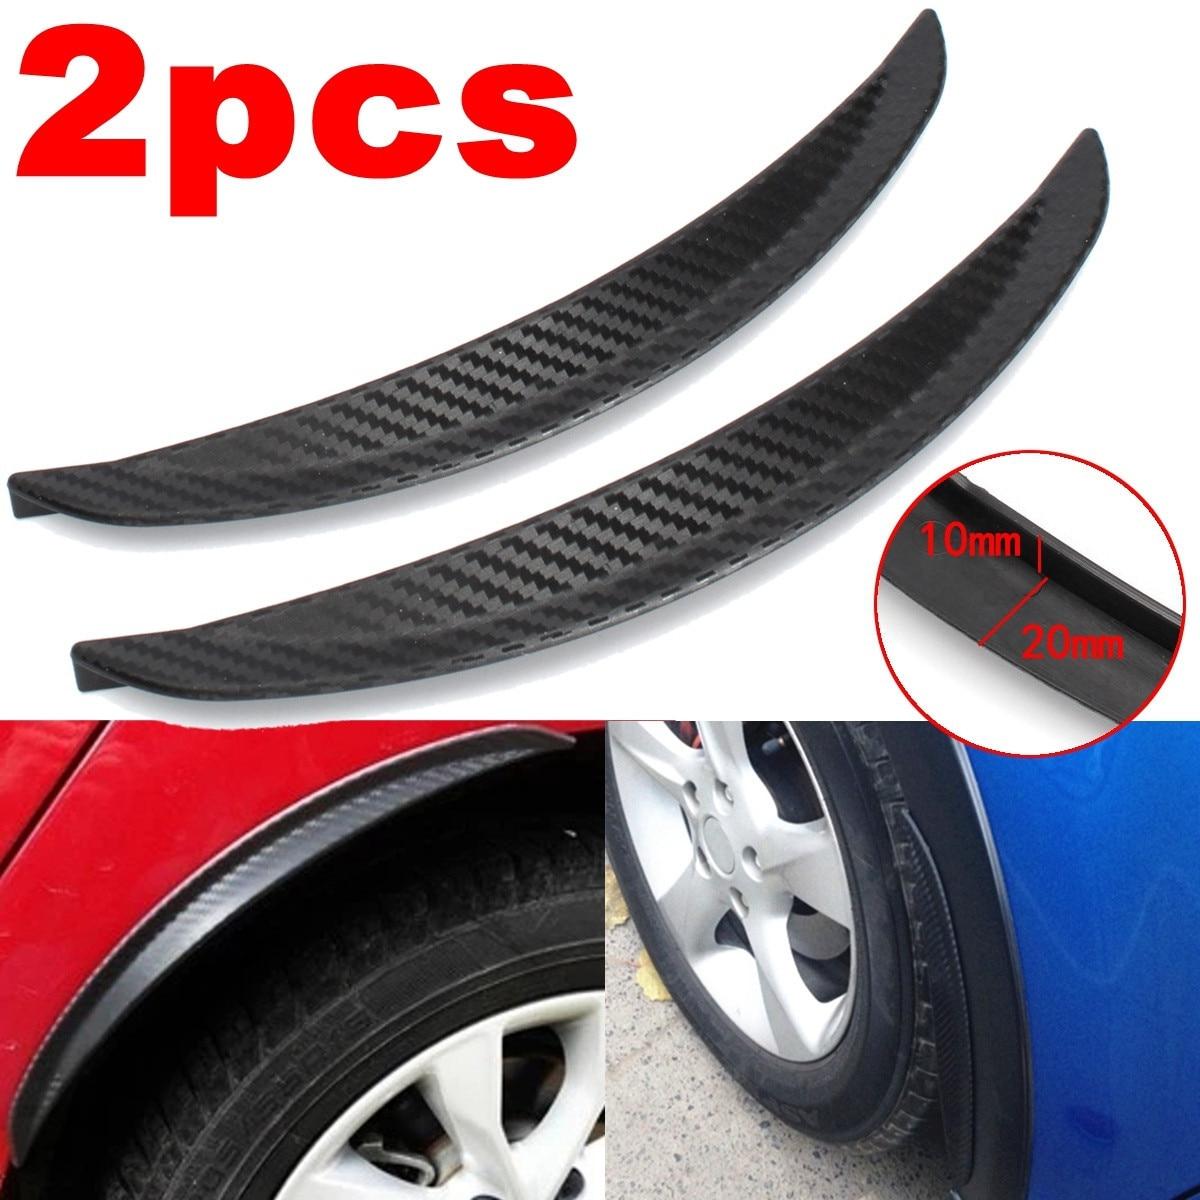 2pcs 24.5cm Universal Car Carbon Fiber Fender Flares Mud Flaps Splash Guards Arch Wheel Eyebrow Lip For Car Truck SUV